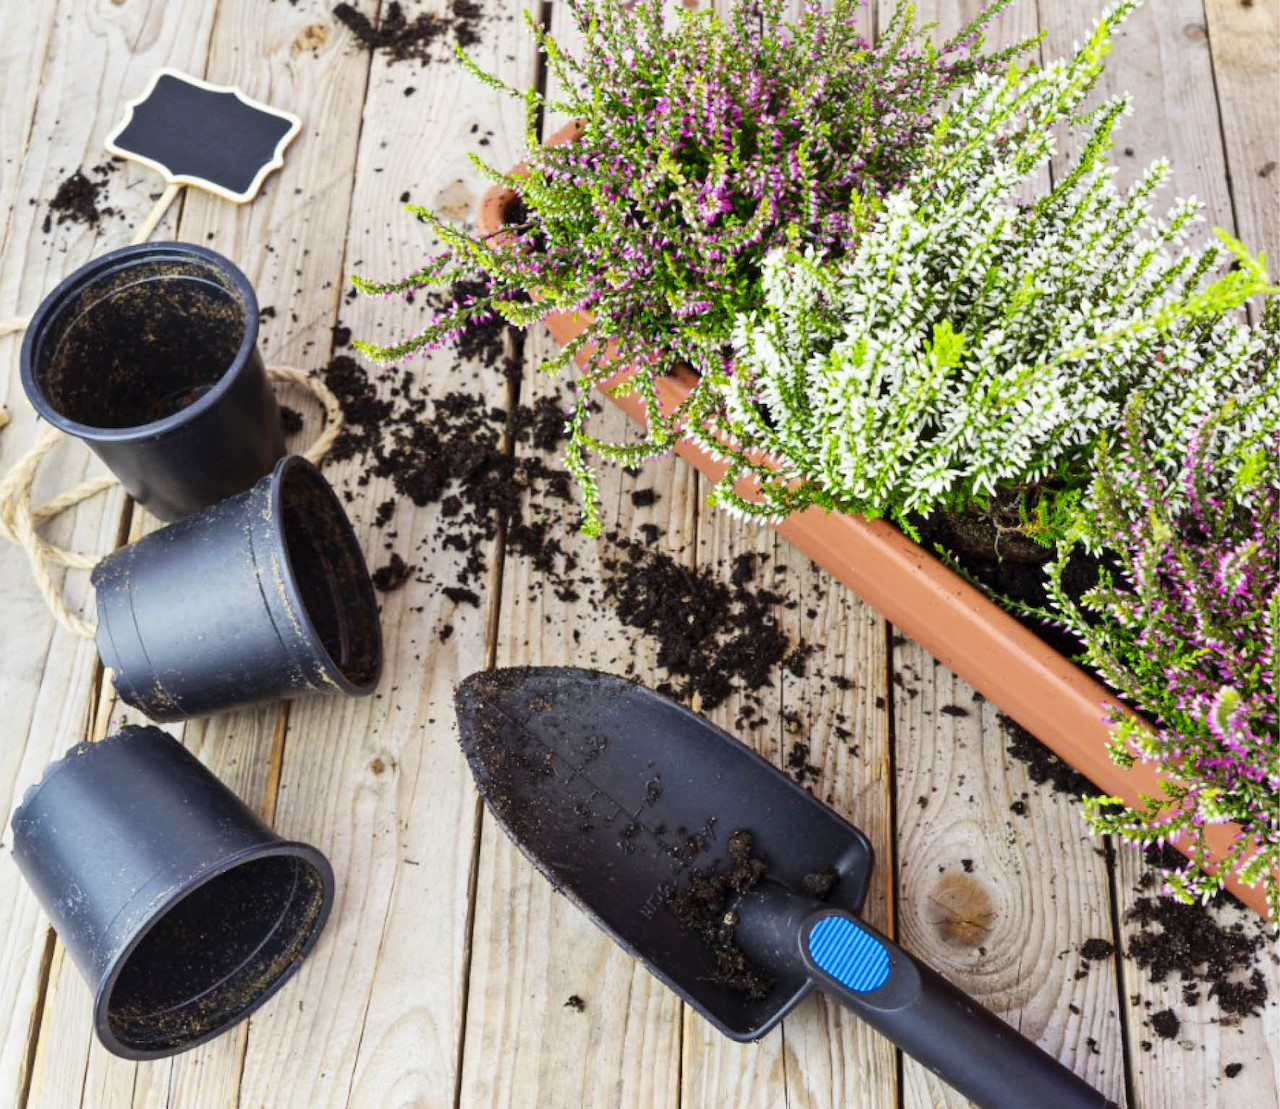 Hoe je best heide plant, verzorgt en snoeit